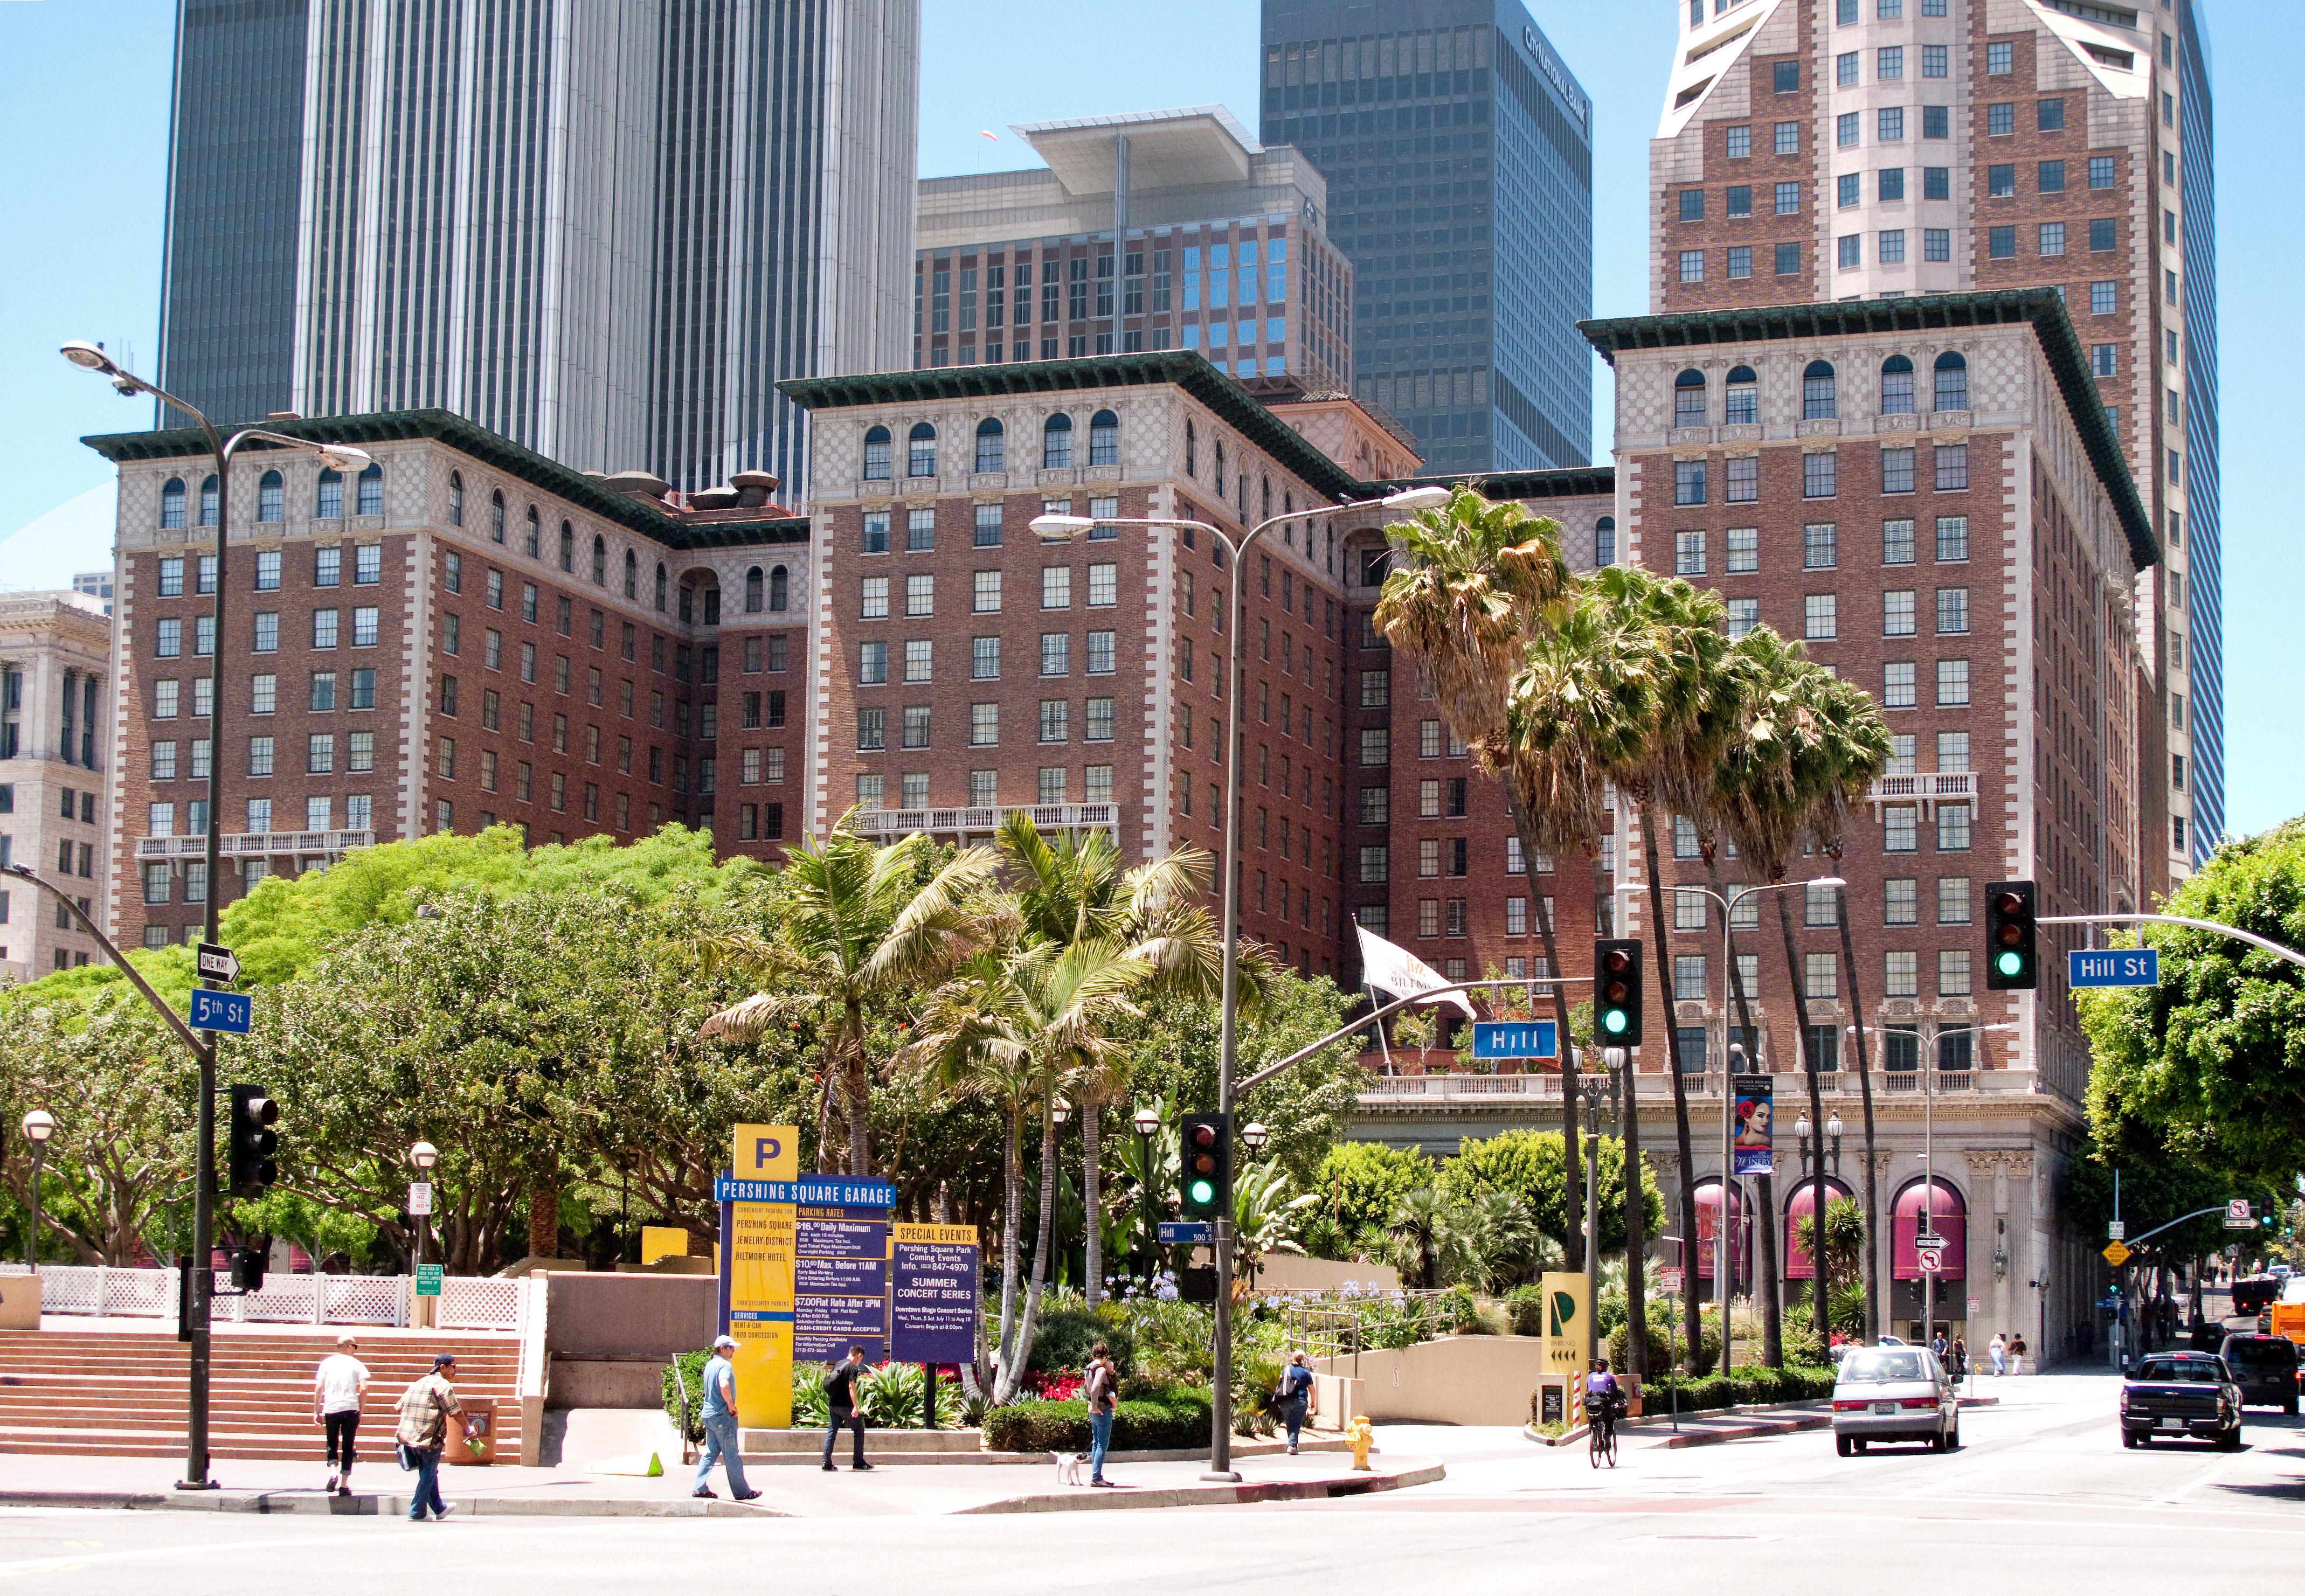 Biltmore Hotel And Suites To City Beach Santa Clara